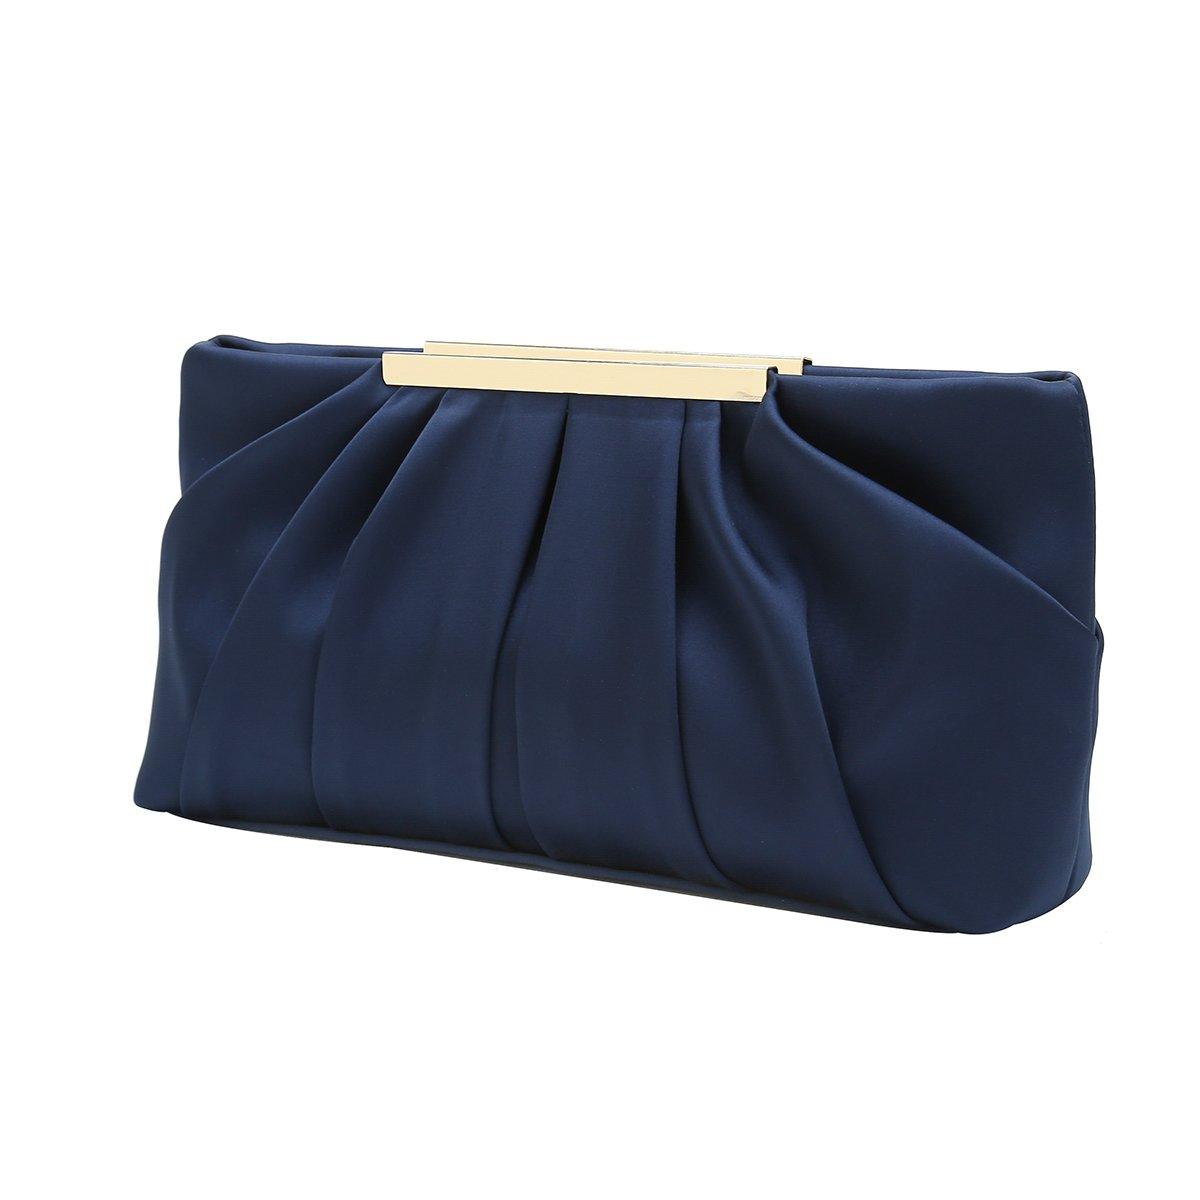 Charming Tailor Clutch Evening Bag Elegant Pleated Satin Formal Handbag Simple Classy Purse for Women (Navy)